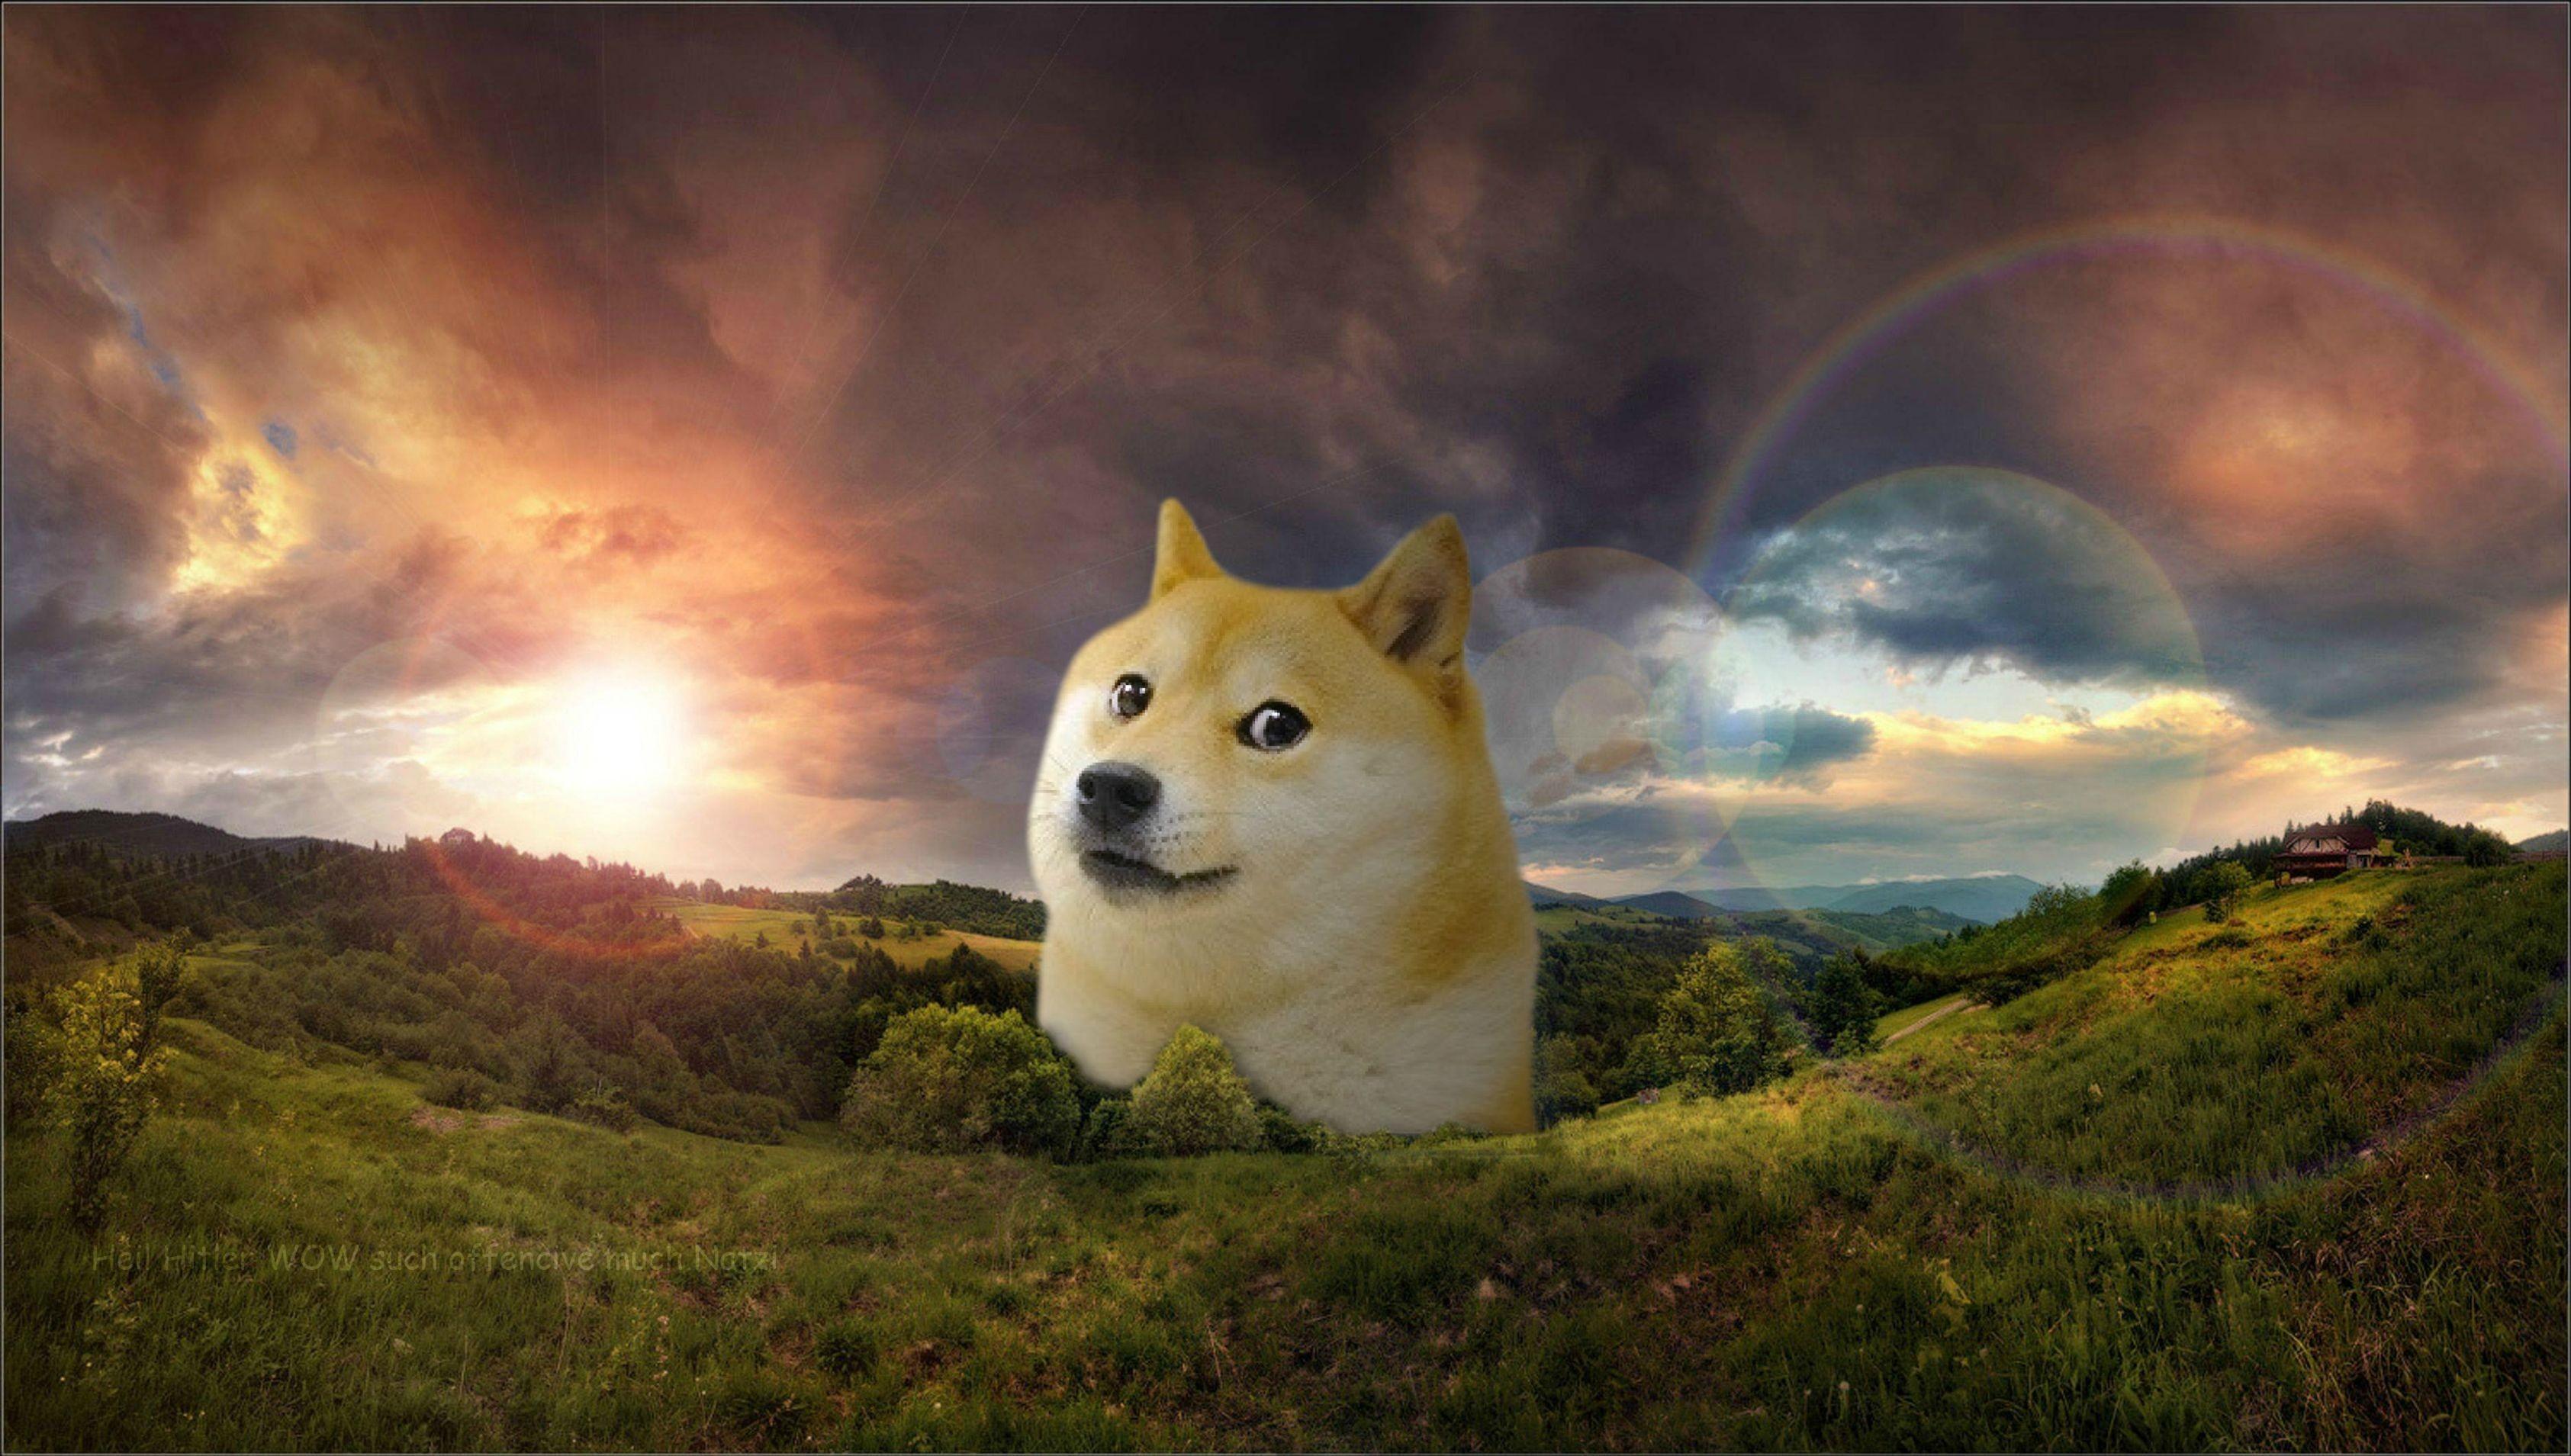 Res: 3370x1909, Doge Meme Wallpaper